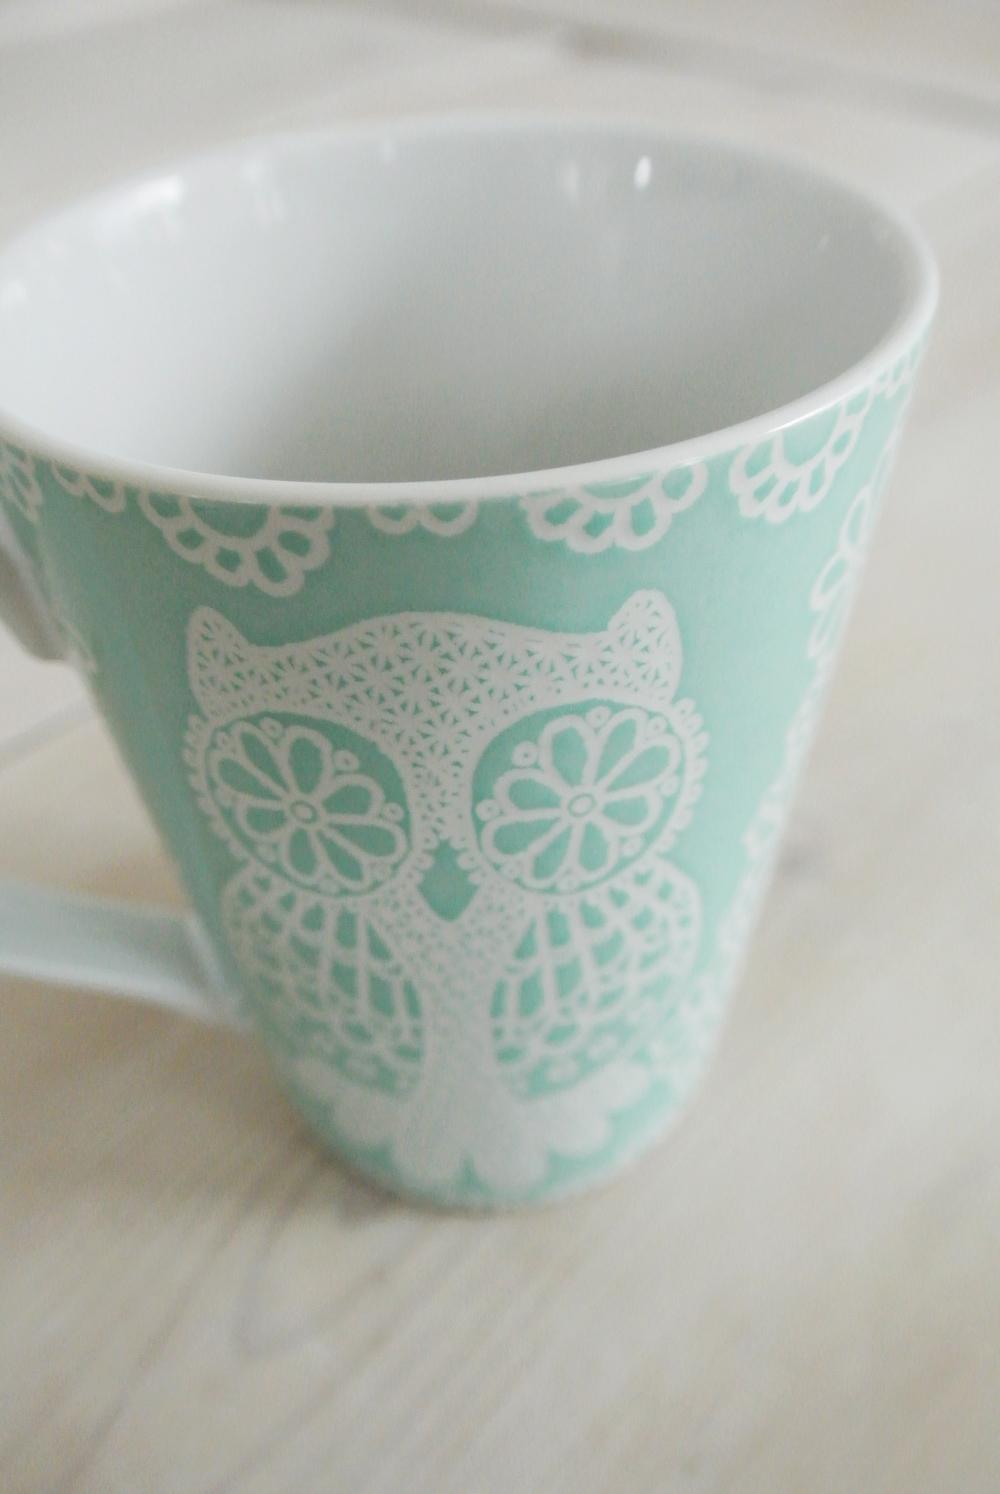 uggla tea cup.jpg